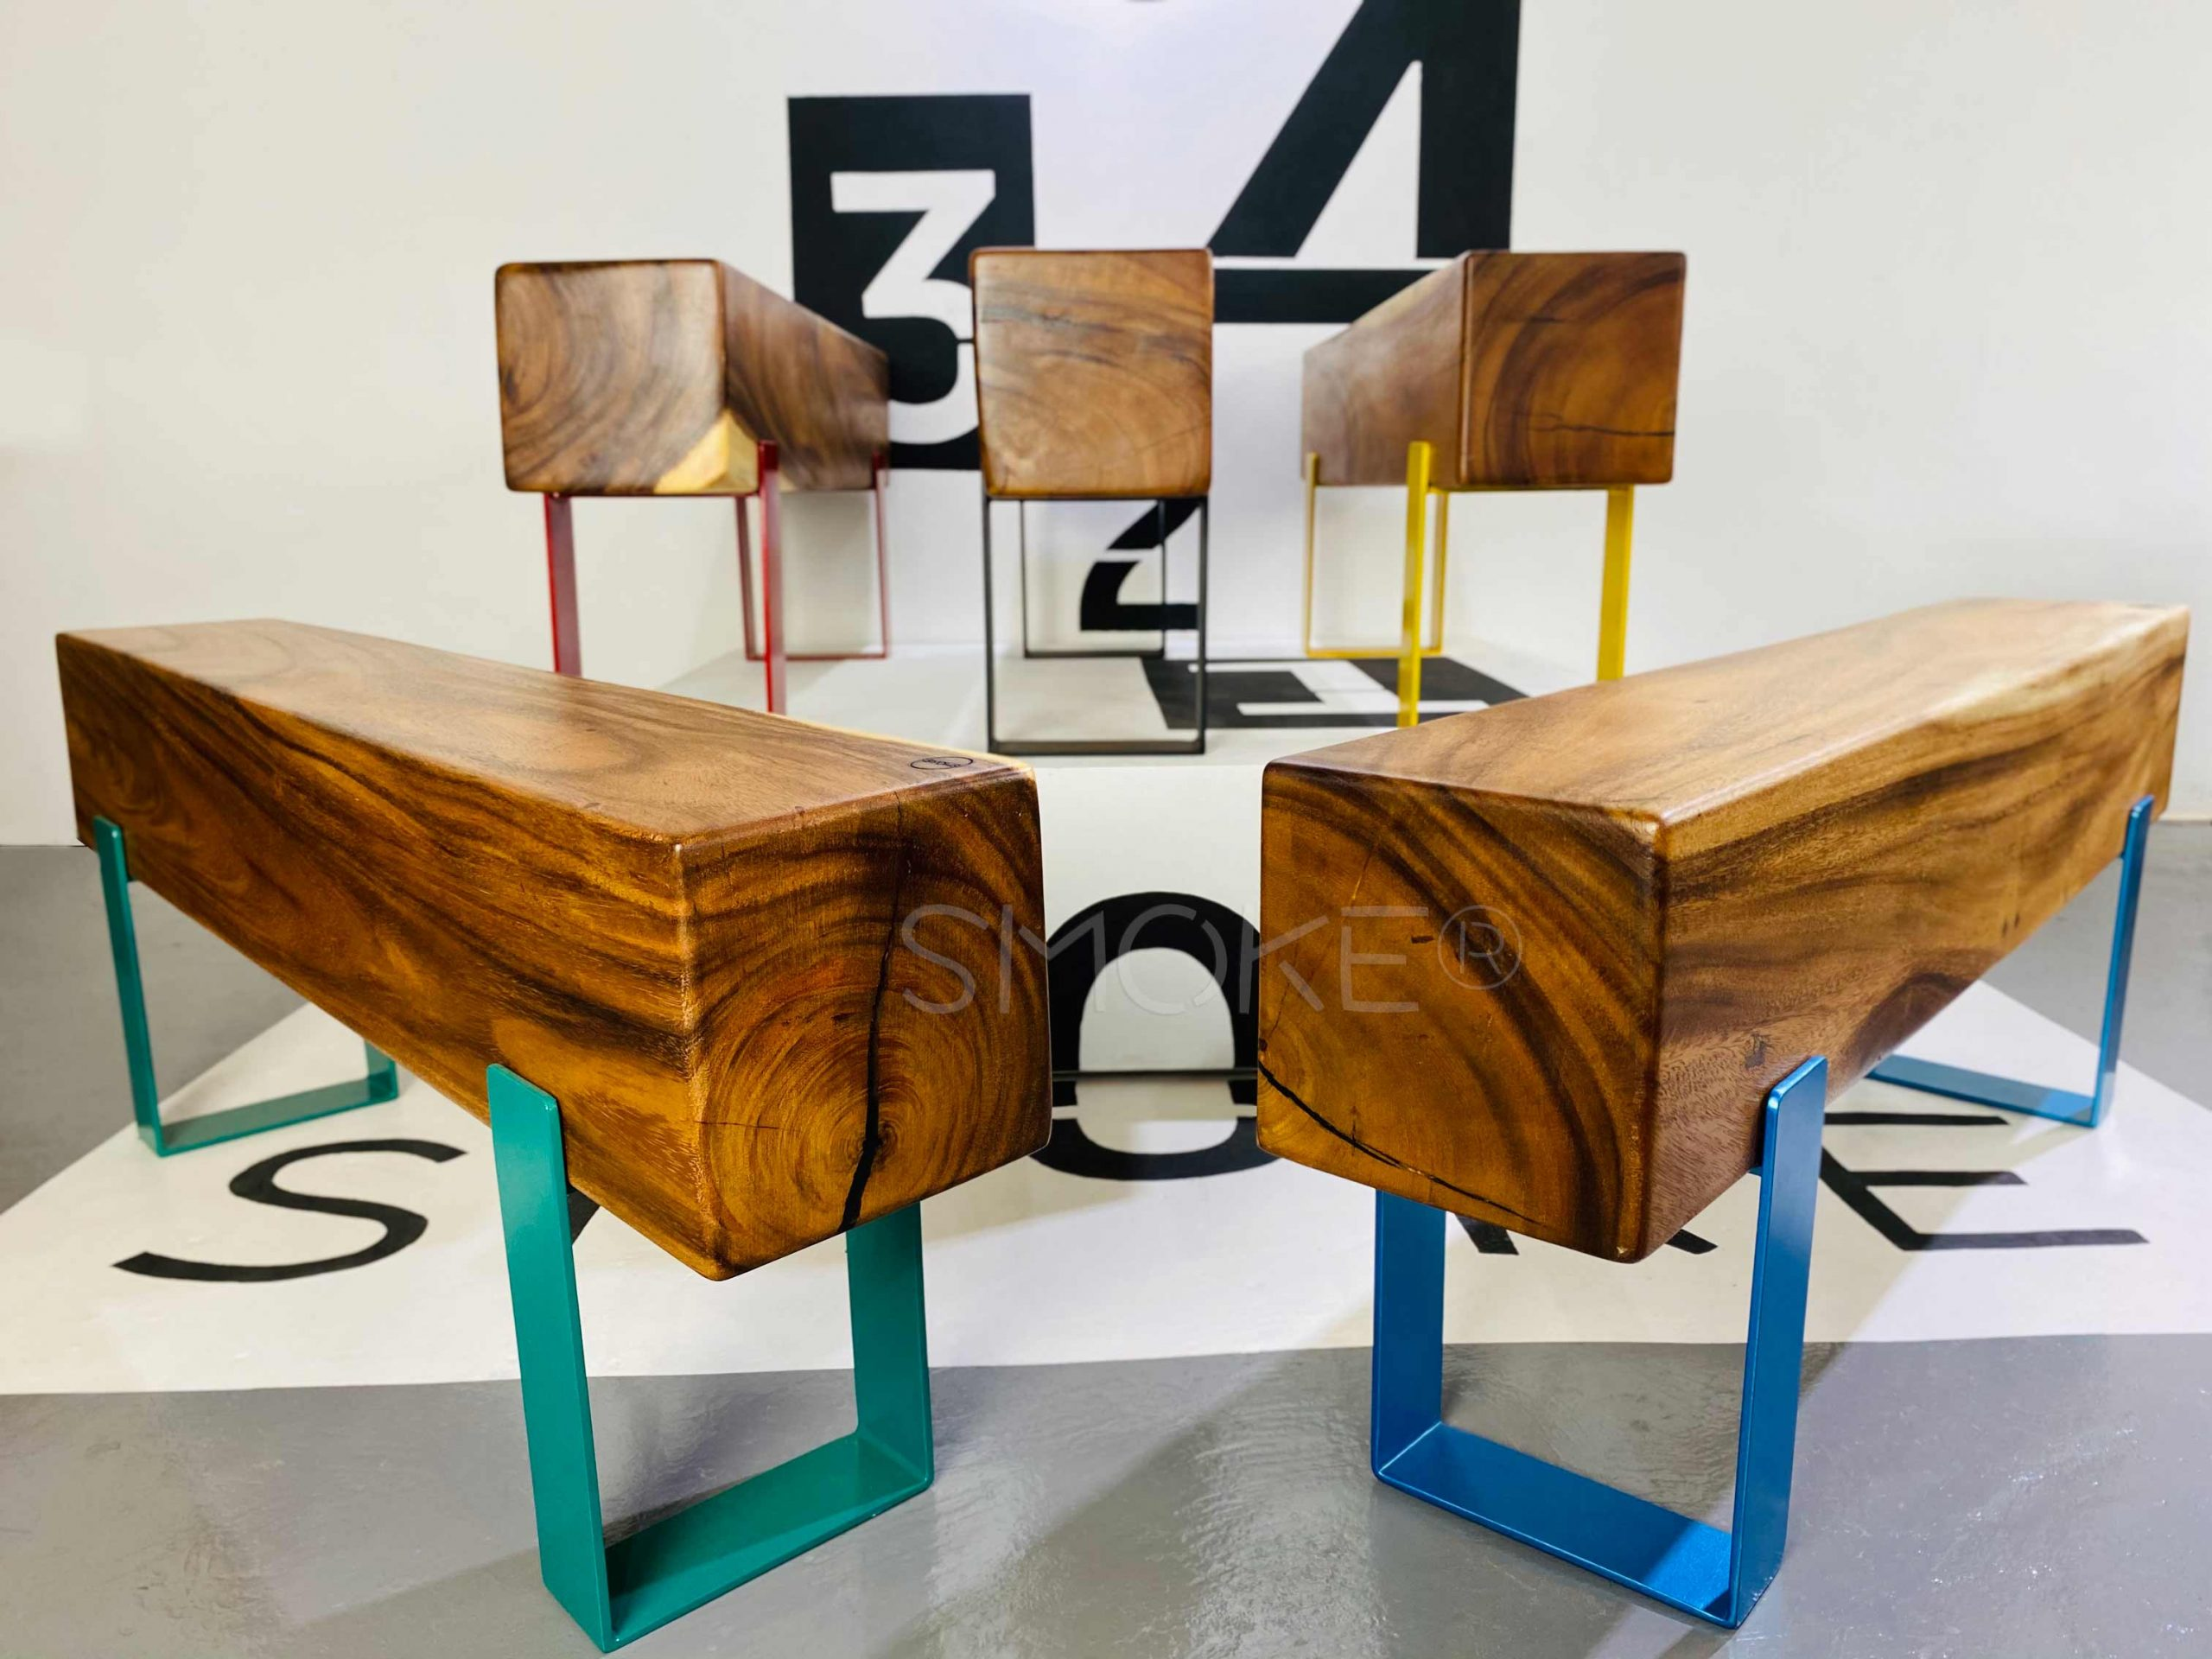 Logan Wooden Bench Perspective Display 3